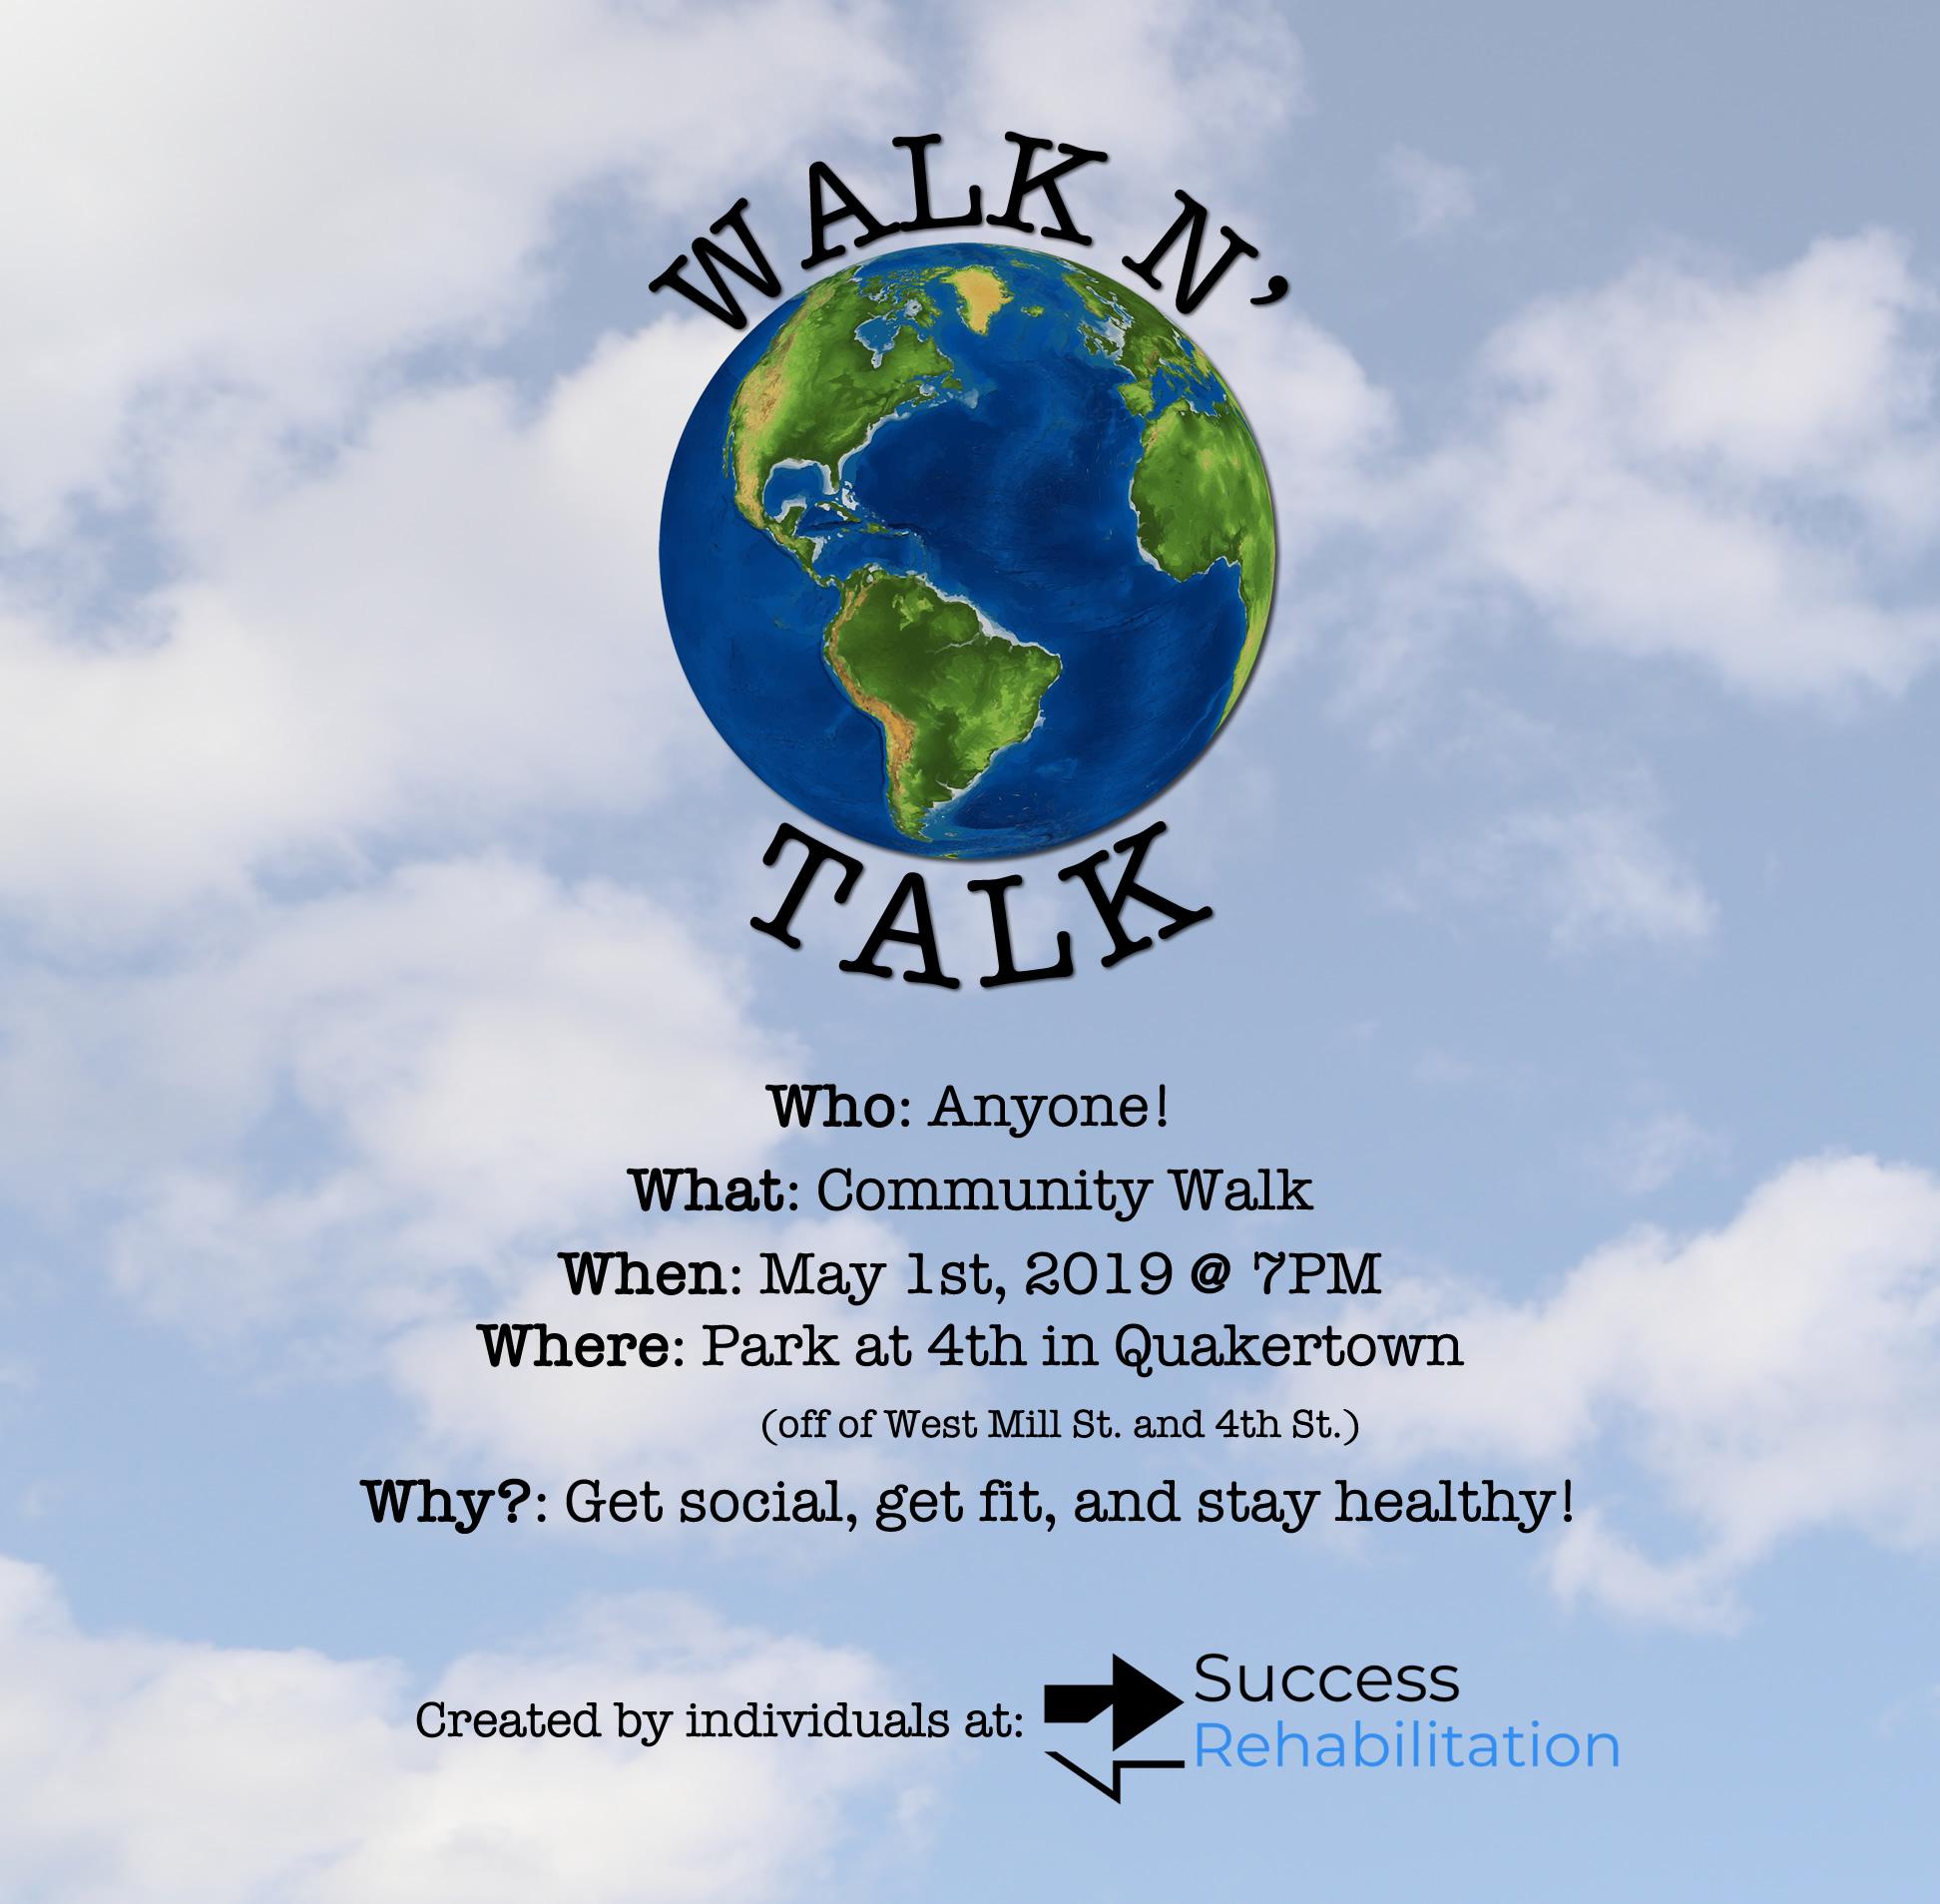 Walk n talk IG post.jpg new.jpg